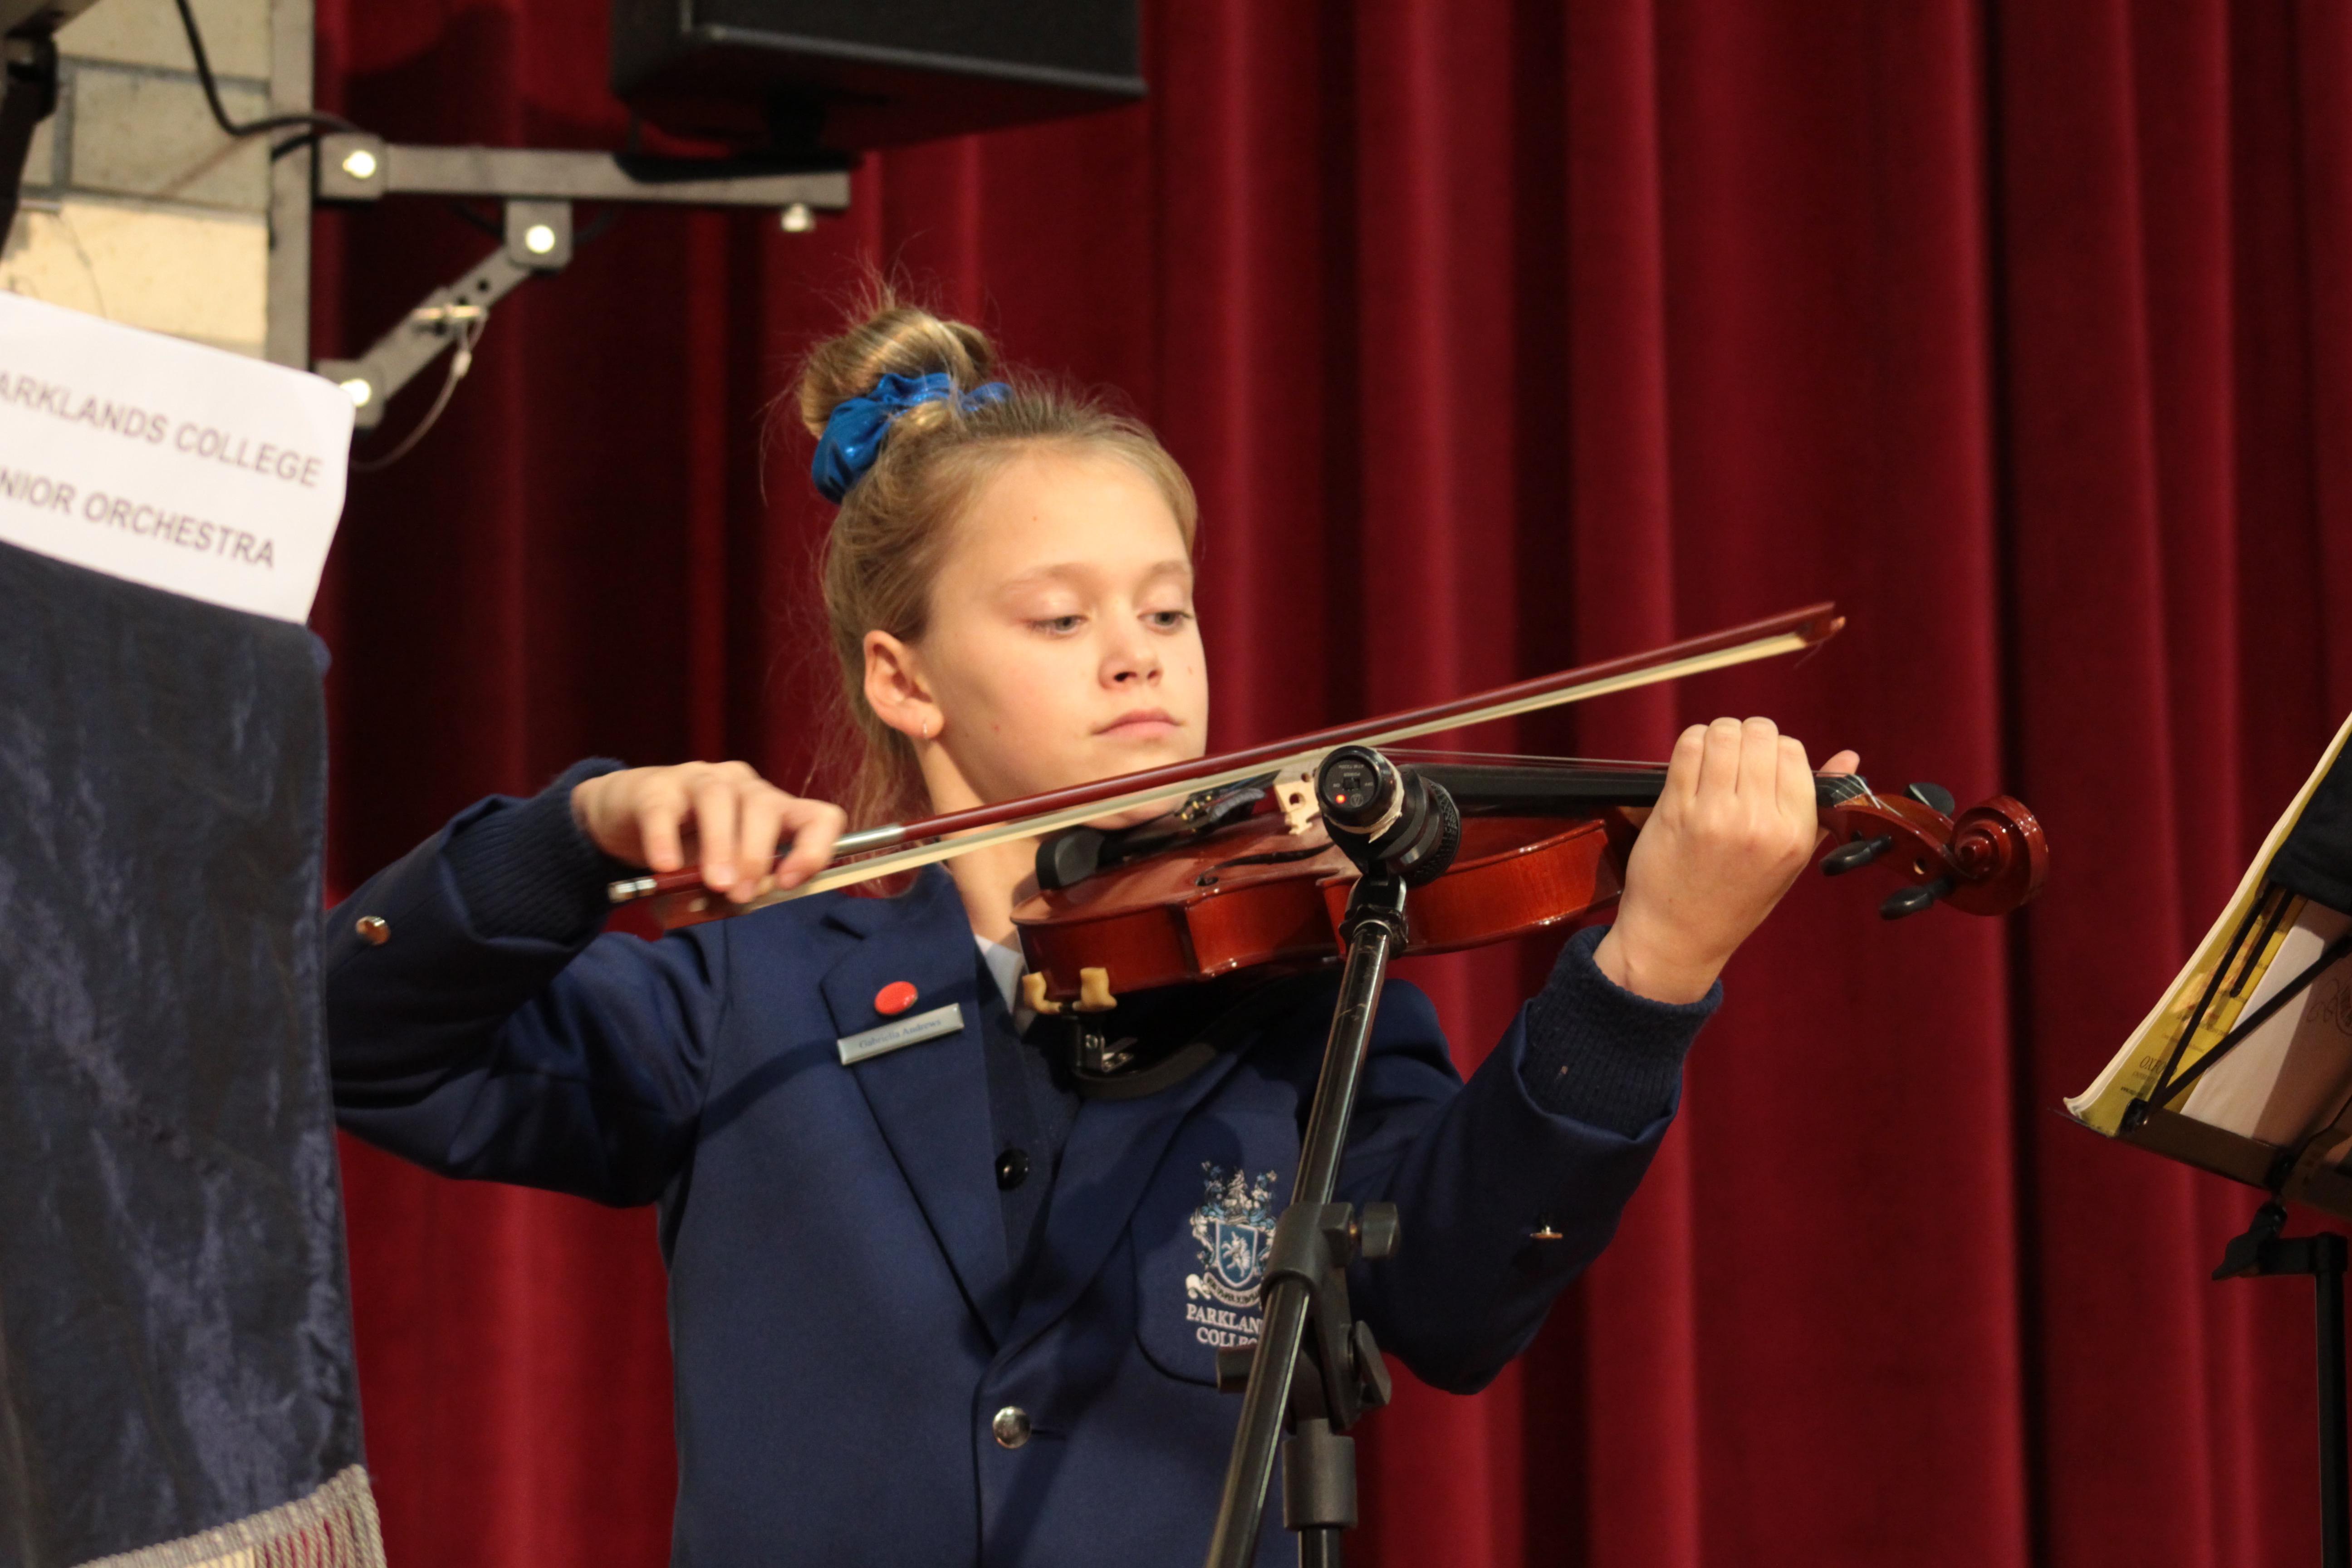 Parklands College Senior Preparatory Violin